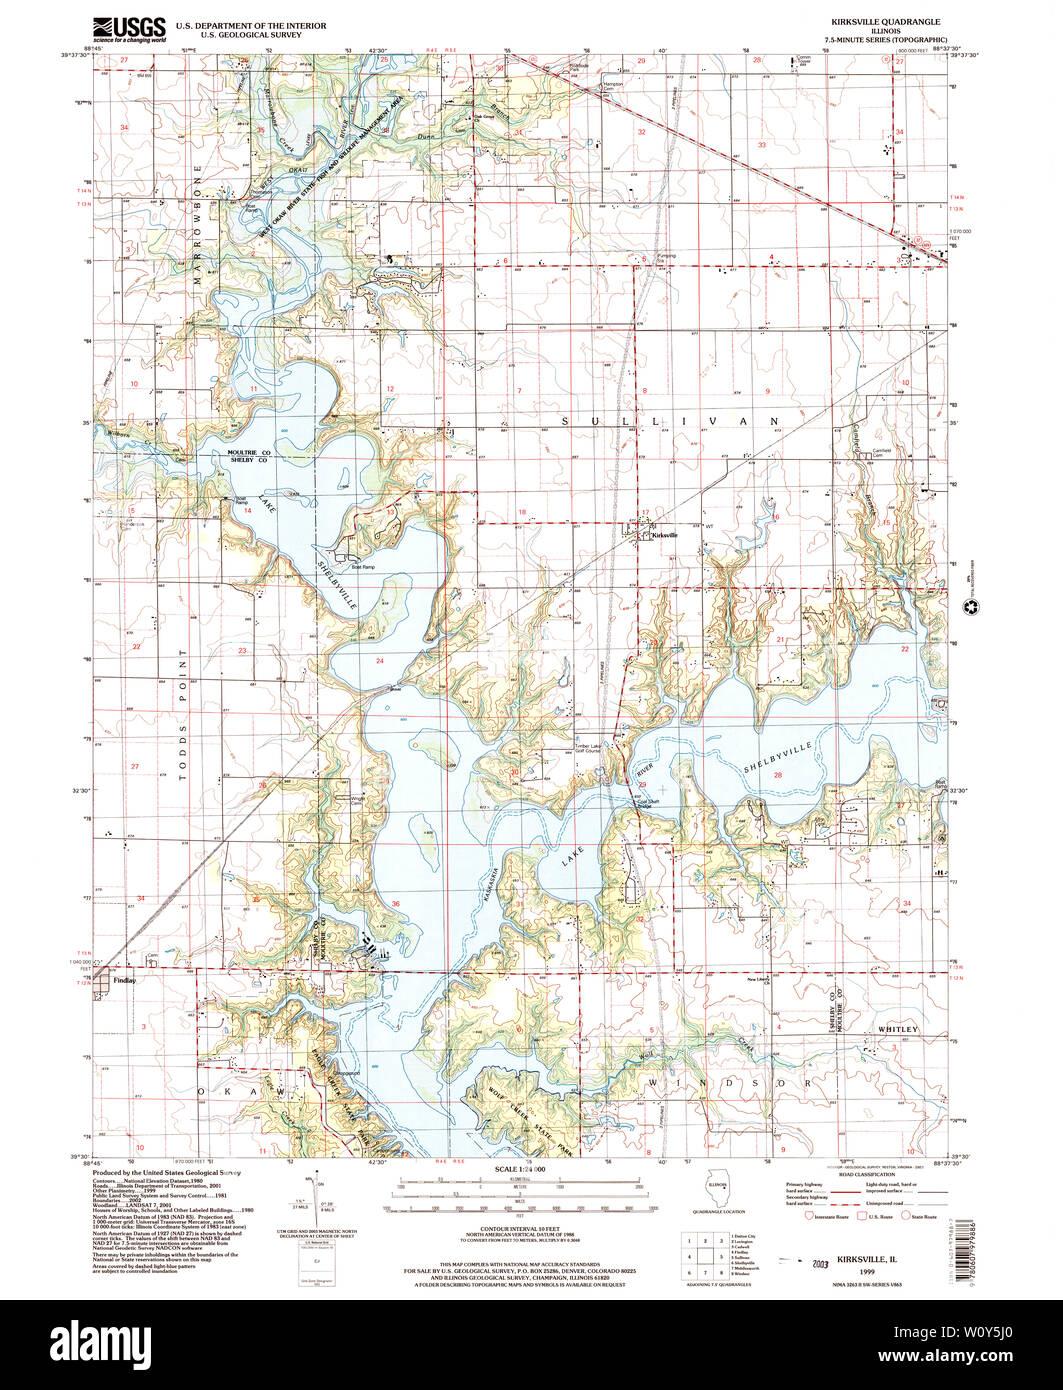 Kirksville Stock Photos & Kirksville Stock Images - Alamy on oak grove map, carthage map, webb city map, london map, branson west map, southwest city map, saint joseph map, rapid city map, springfield il map, fair grove map, sioux city map, willow springs map, adair county map, dunklin county map, western il map, earth city map, van buren park map, belton map, santa ana map, lees summit map,